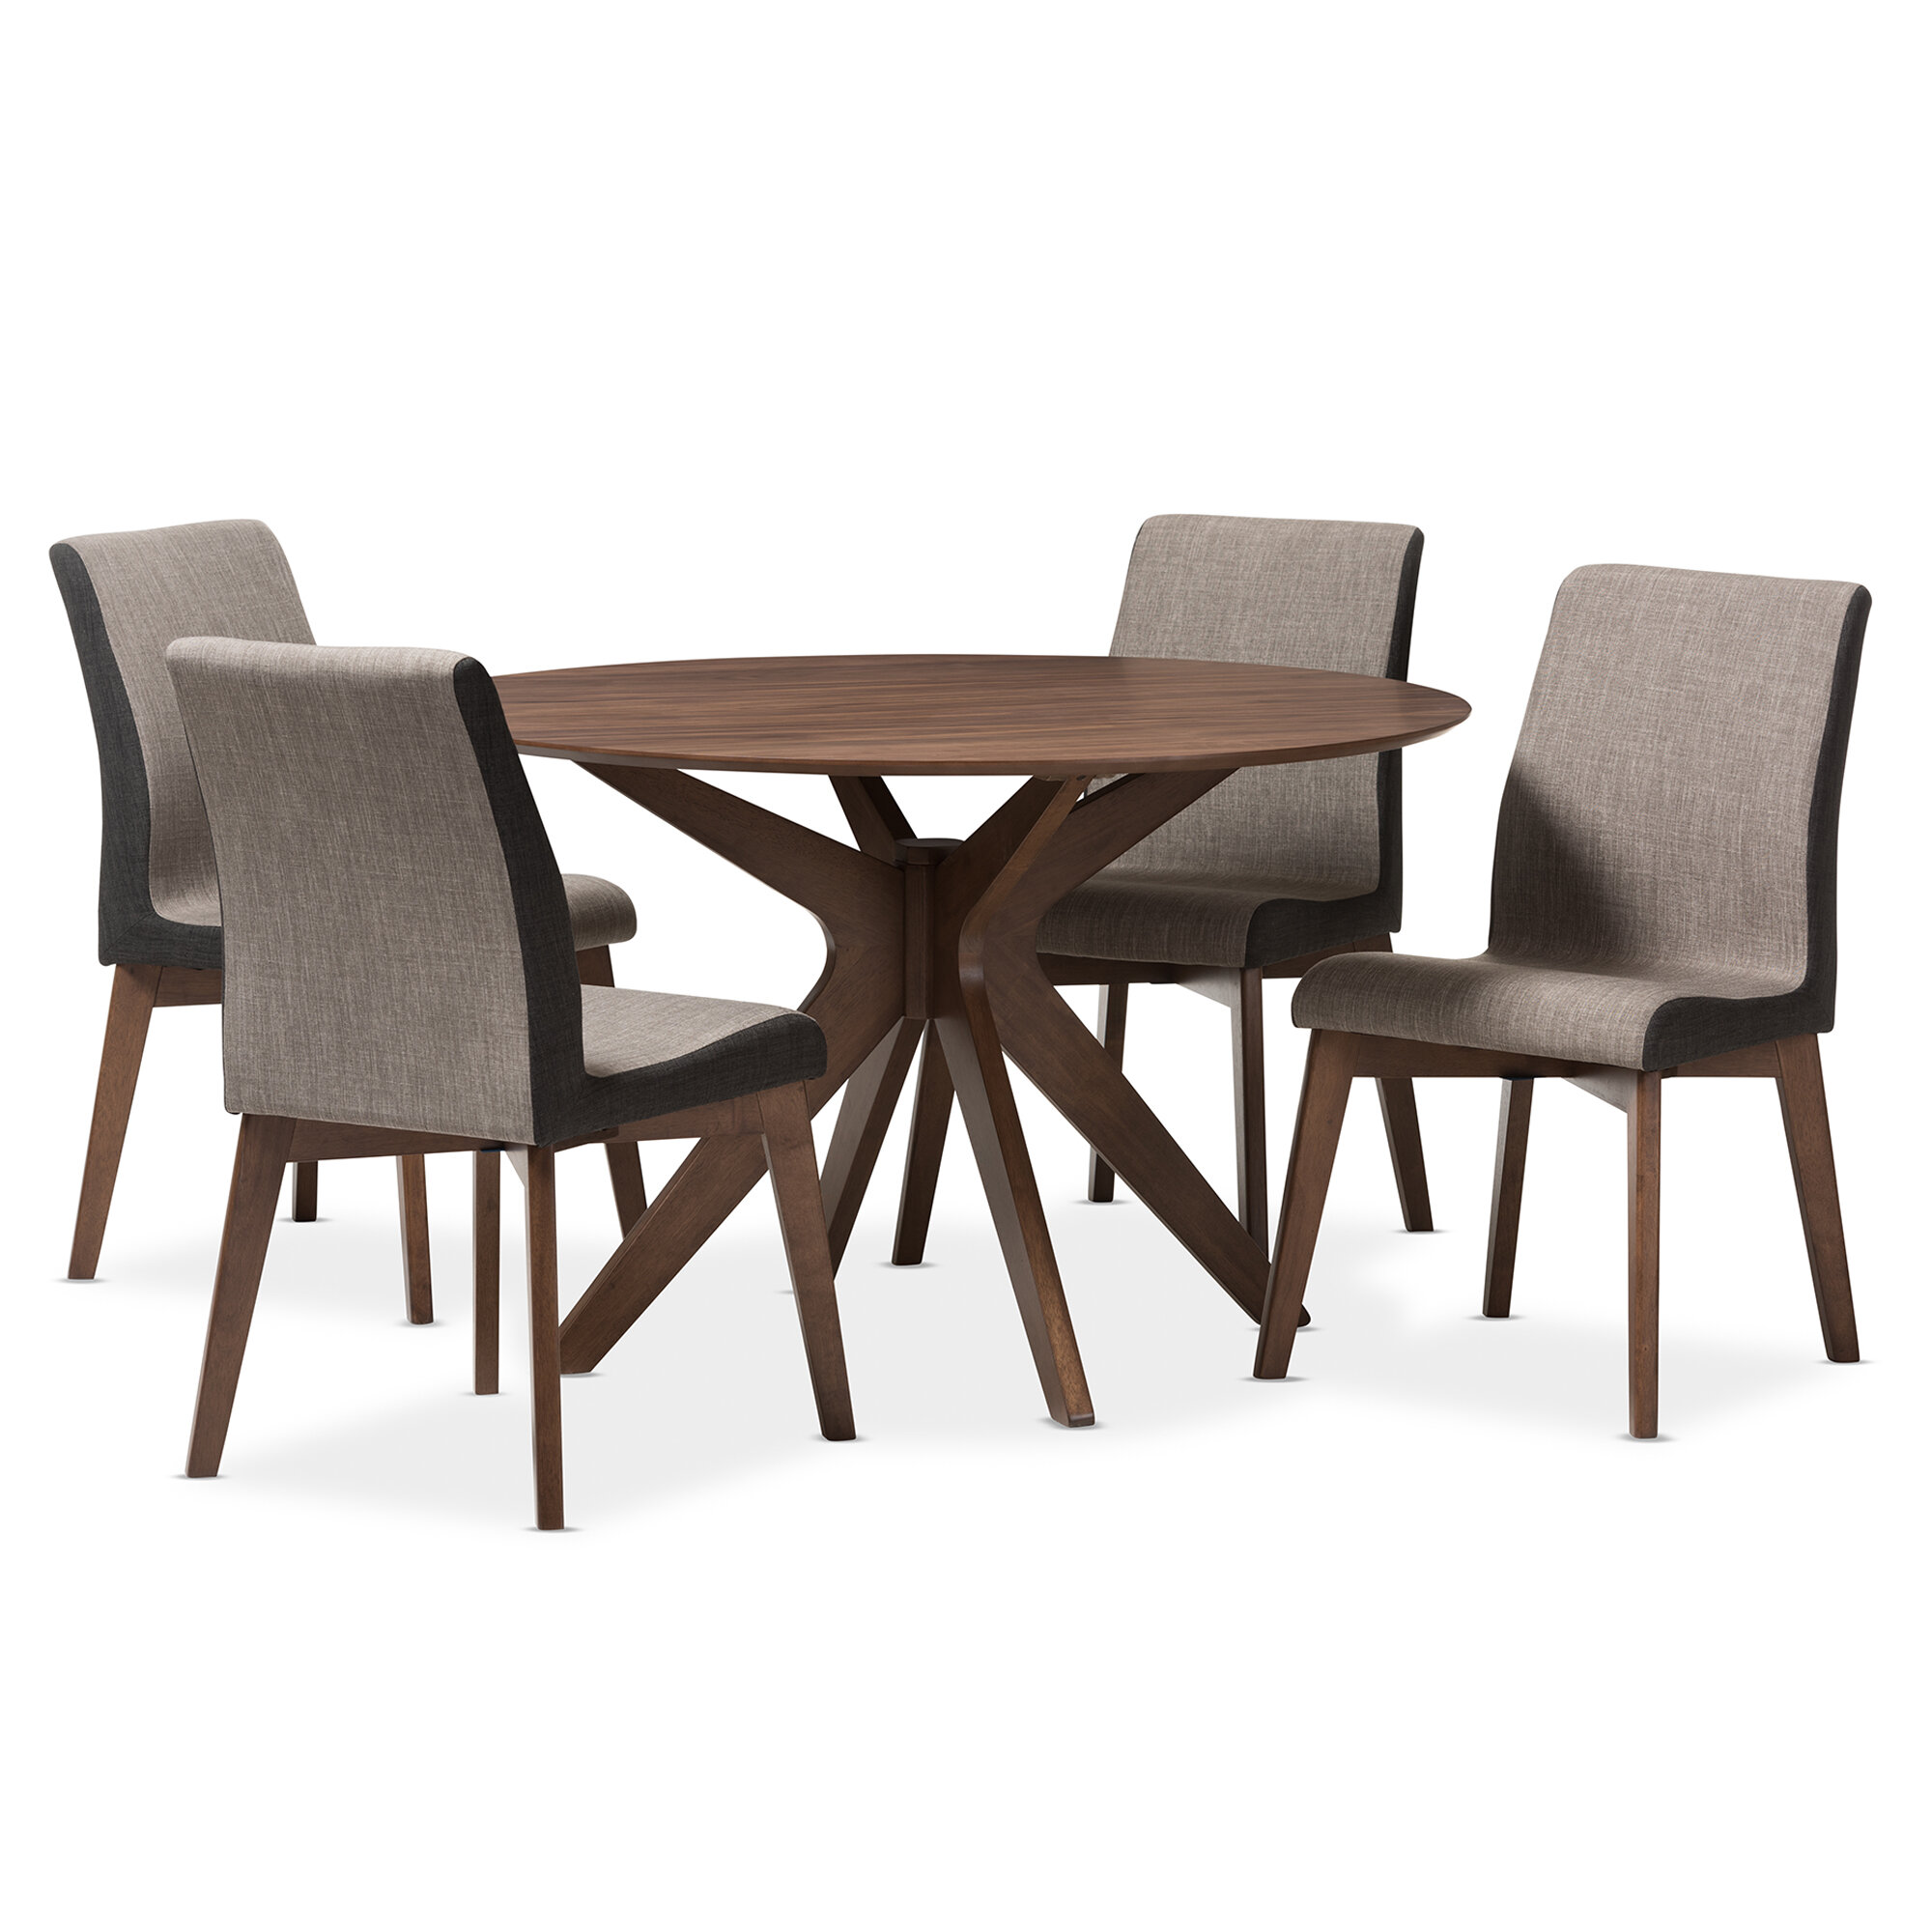 Kimberly Mid-Century Modern Wood Round 5 Piece Dining Set